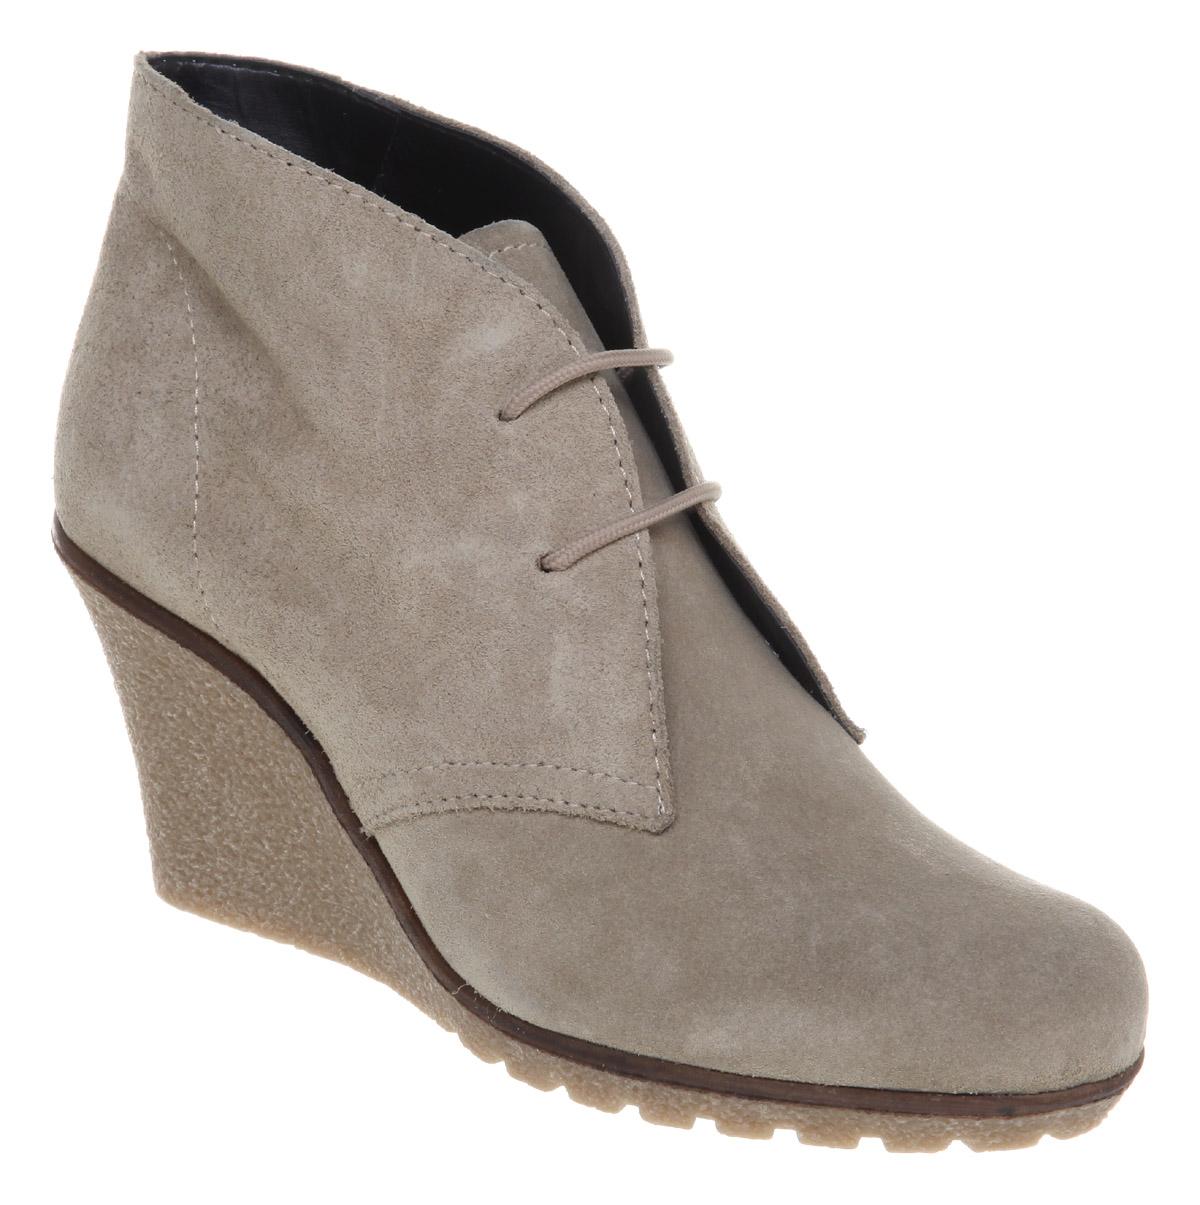 office kactus wedge boot suede in gray desert lyst